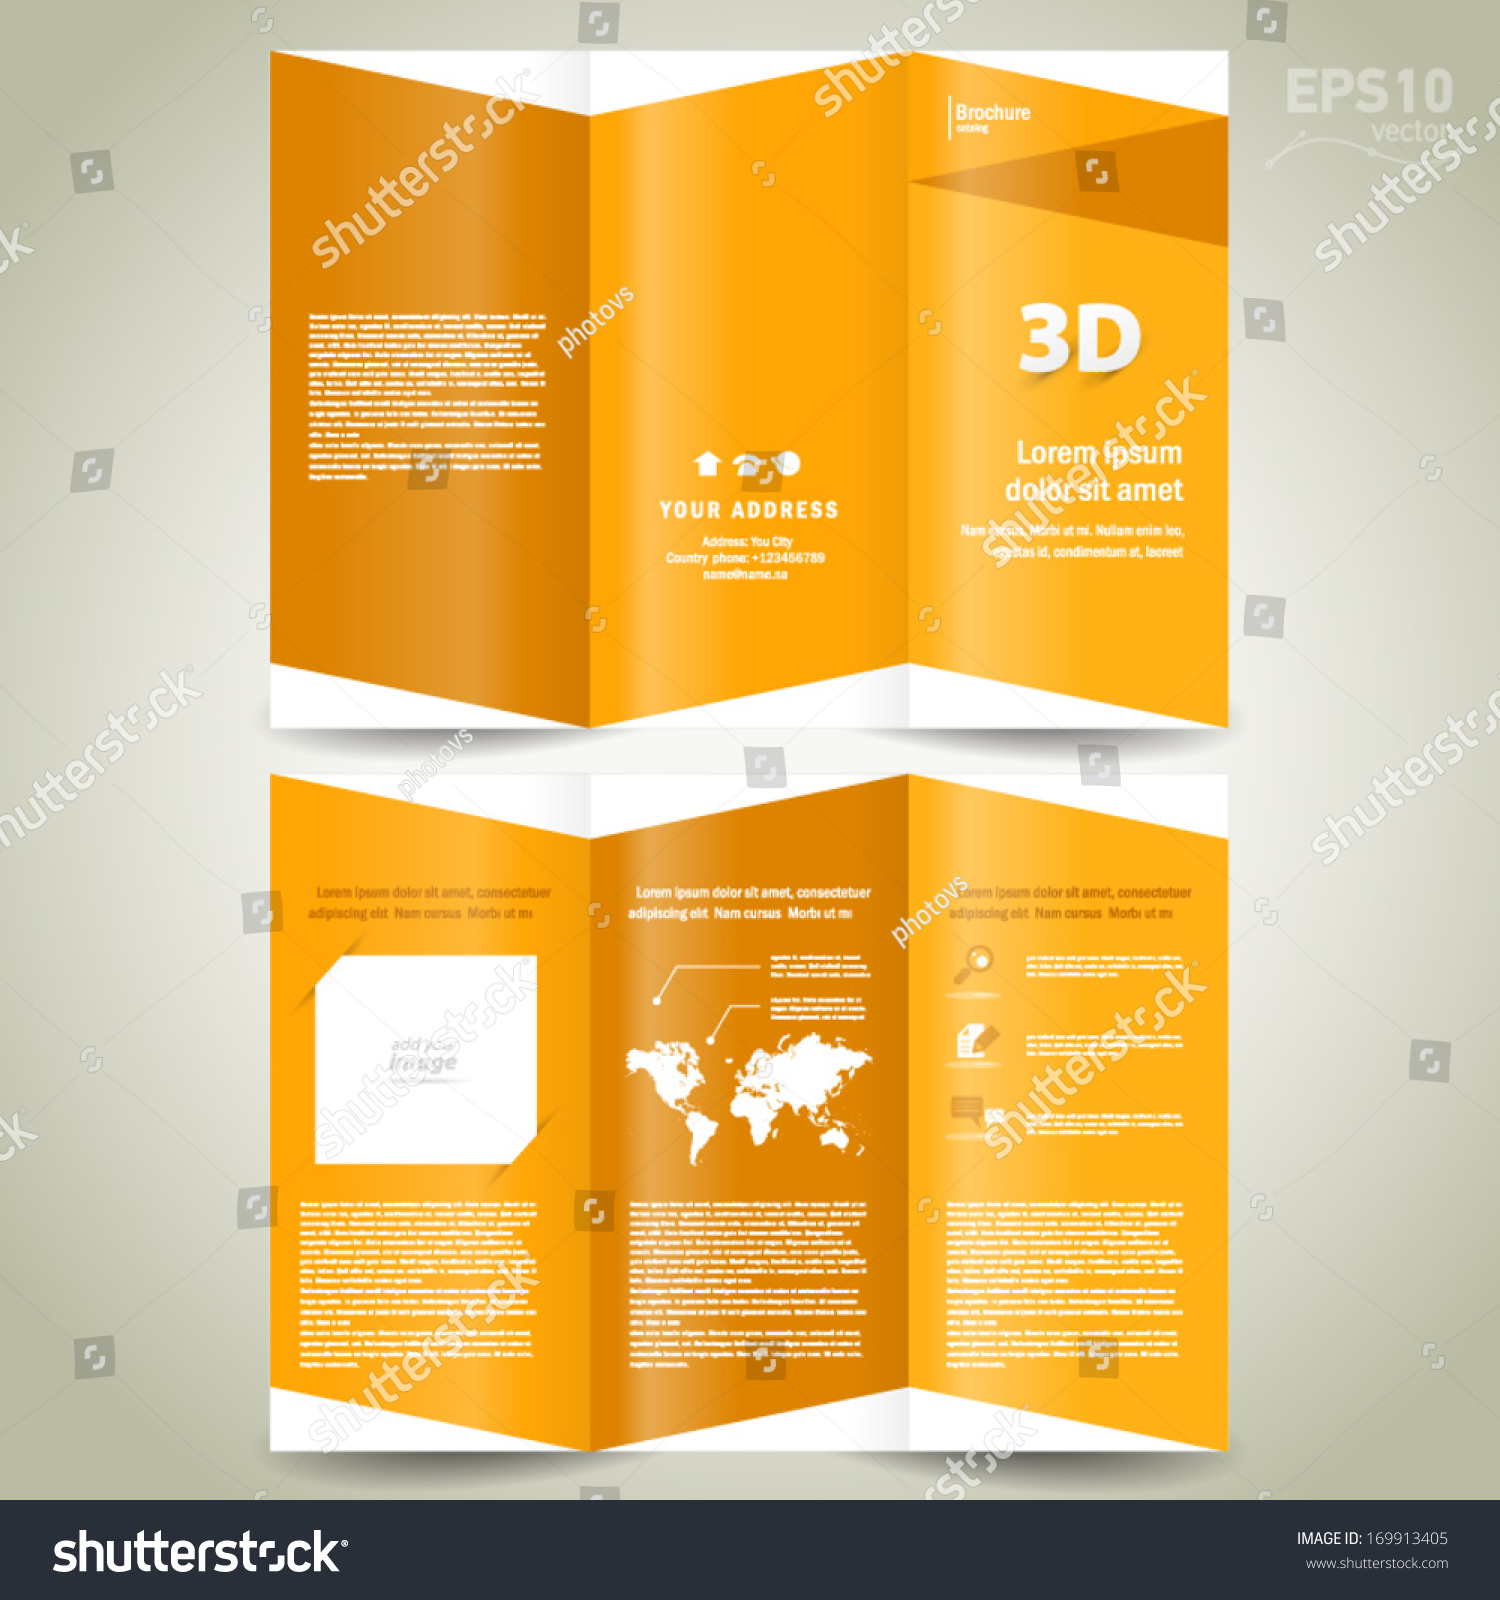 D Dimensional Design Brochure Template Folder Stock Vector - 3d brochure template